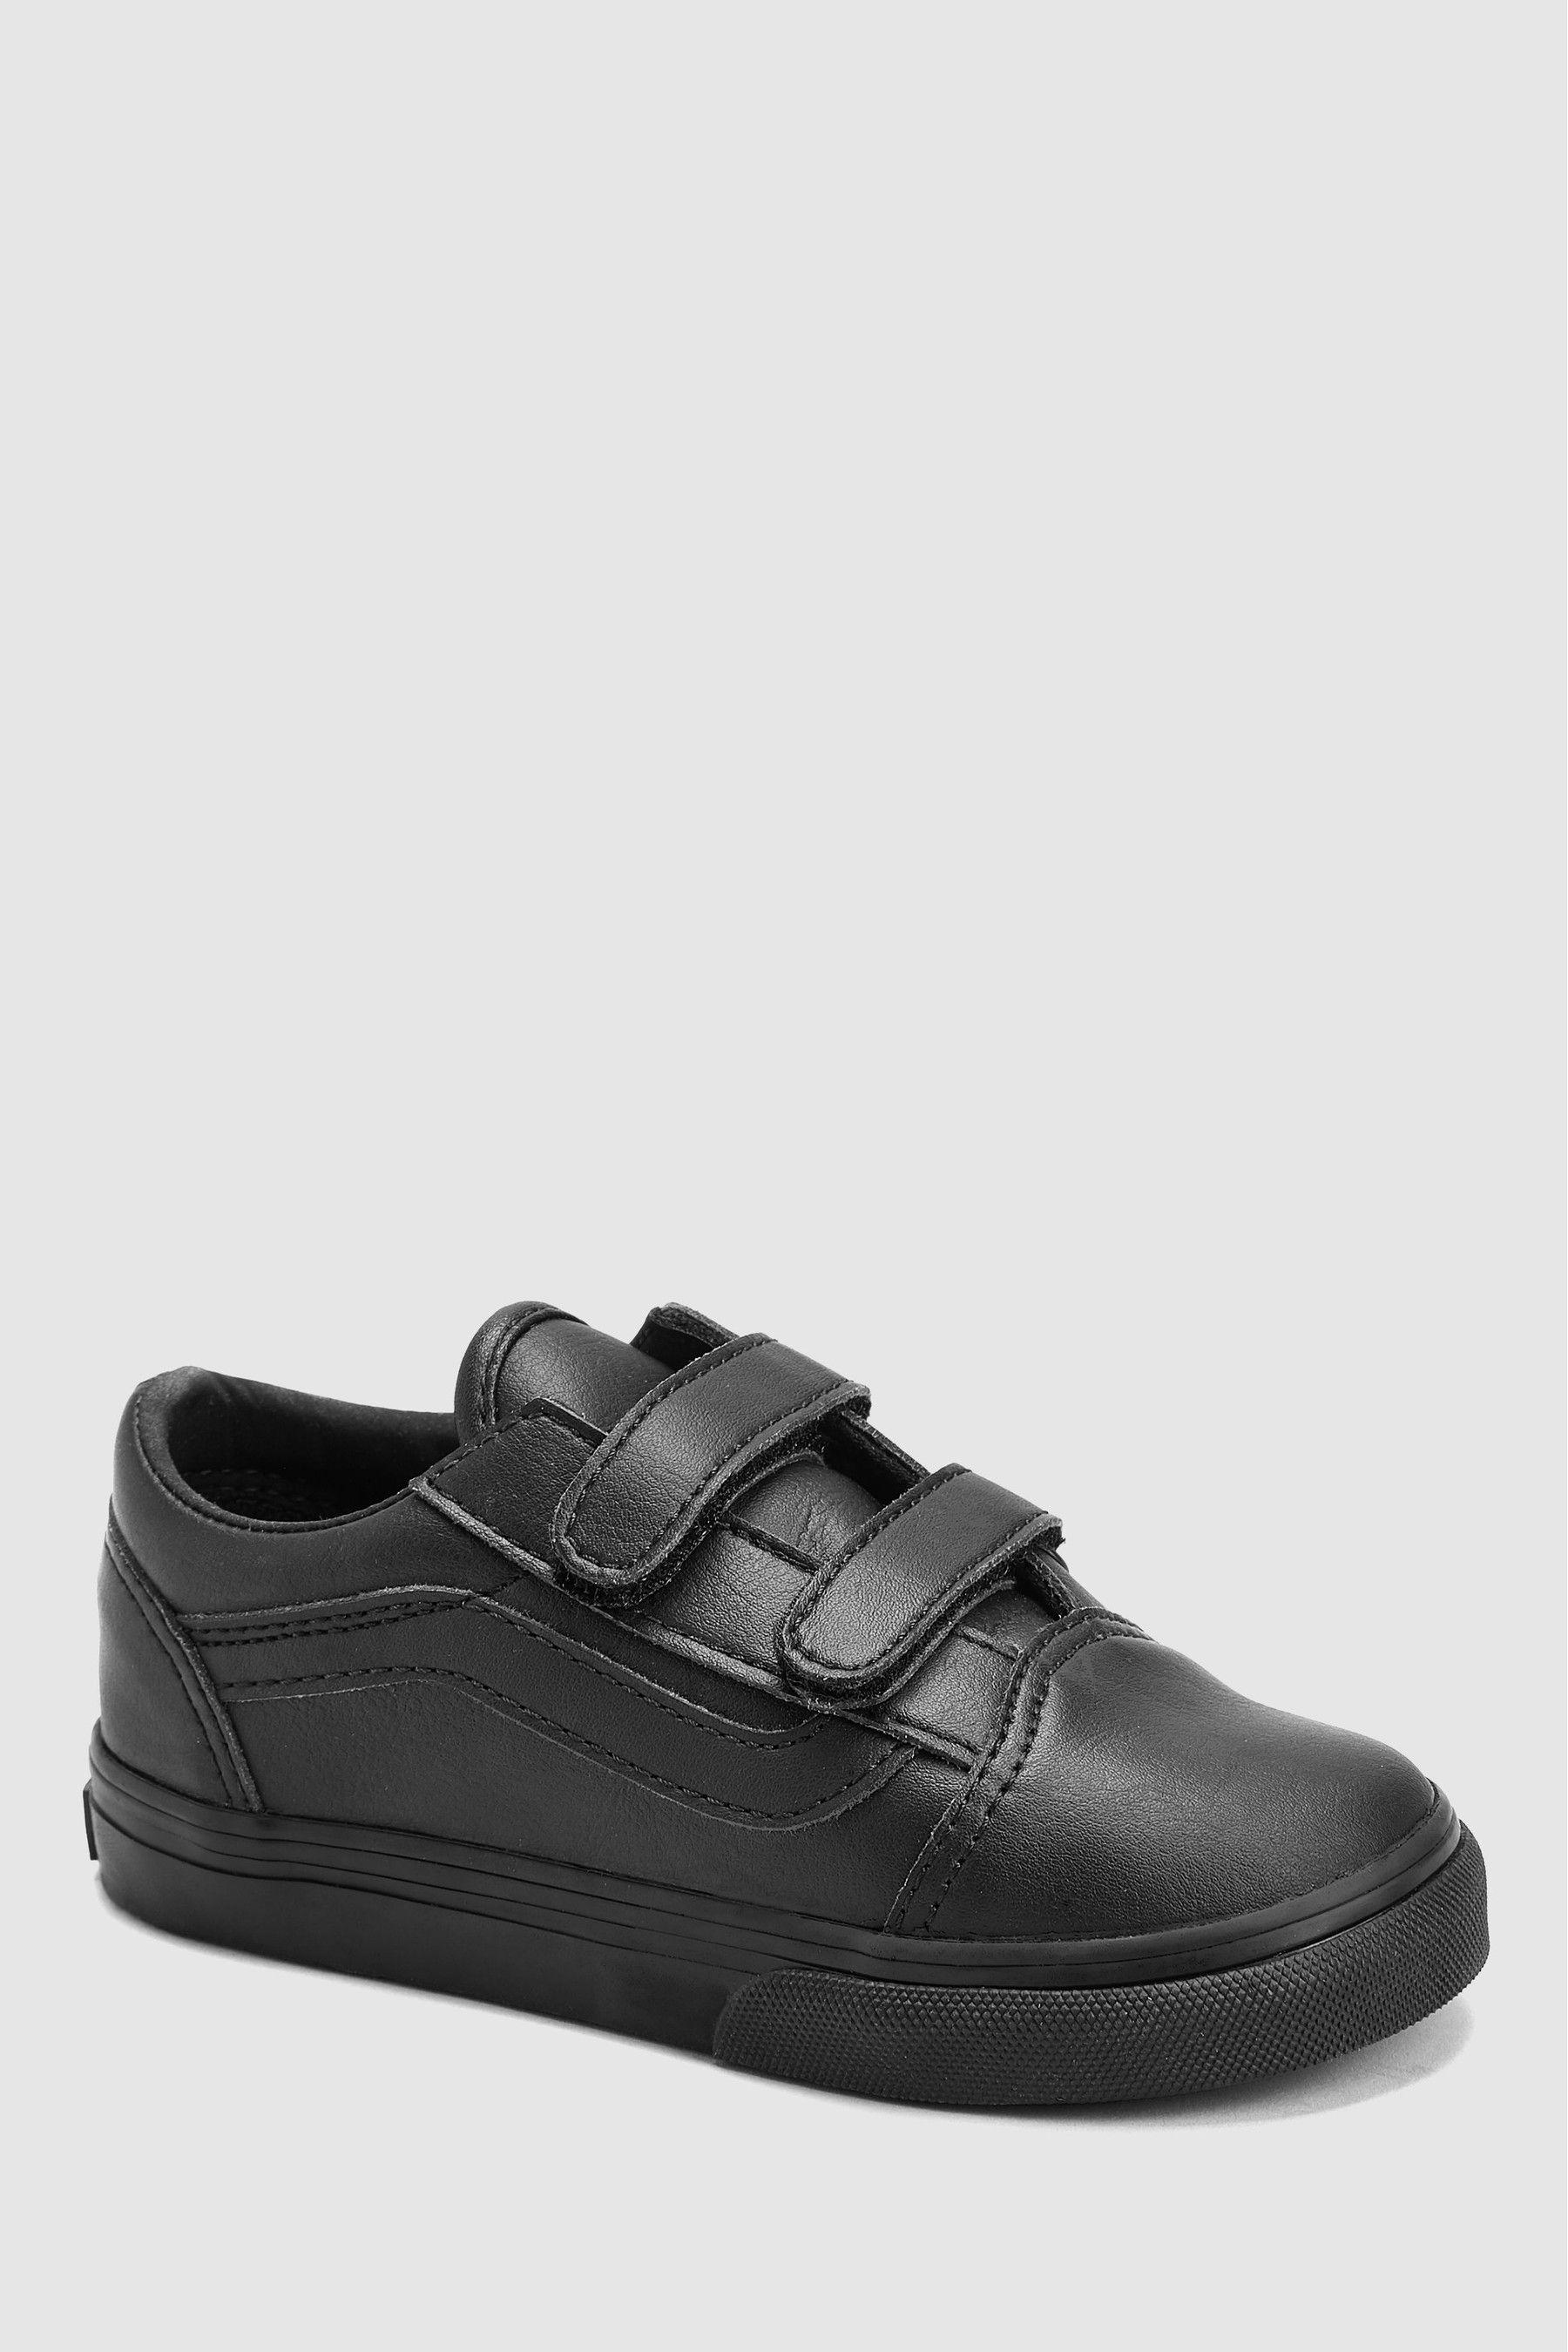 Boys Vans Infant Black Leather Old Skool Velcro Black